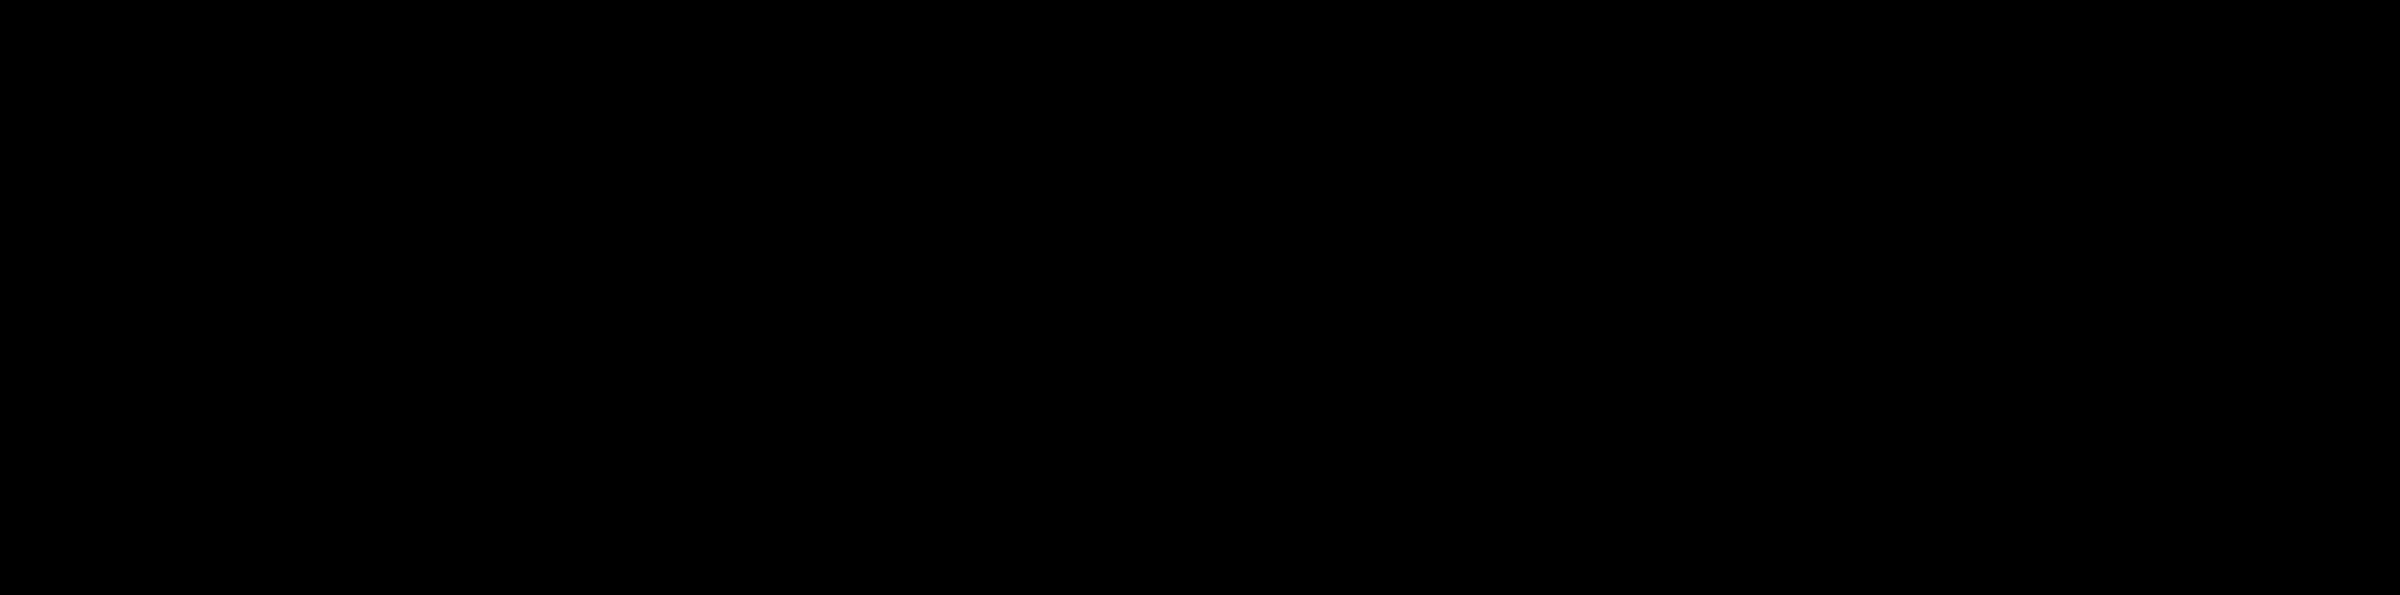 esquire-logo-black-and-white